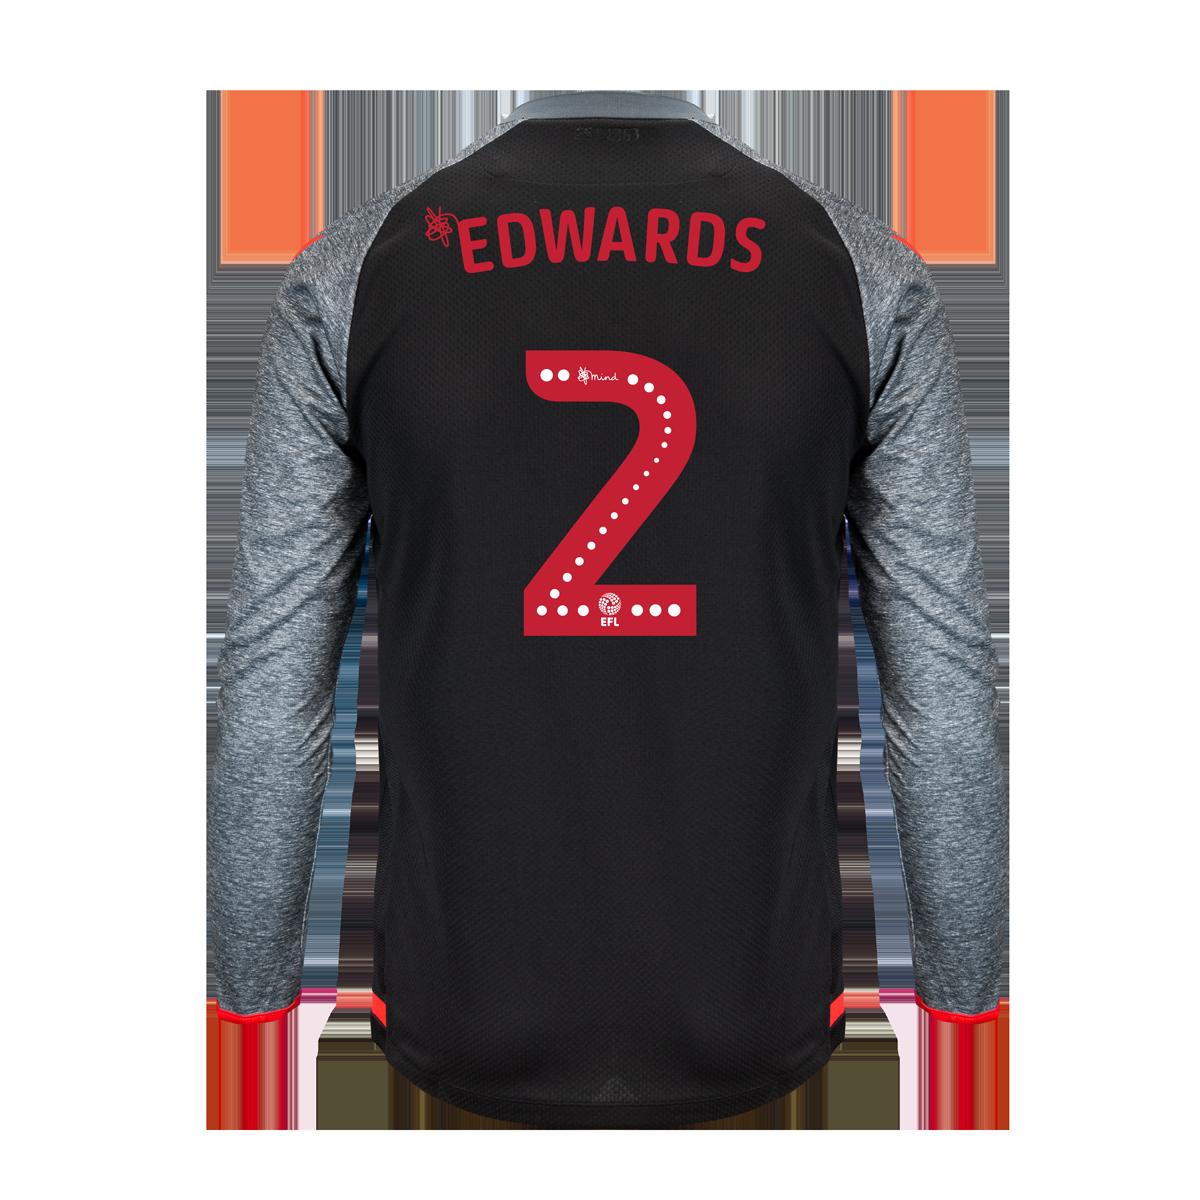 2019/20 Junior Away LS Shirt - Edwards